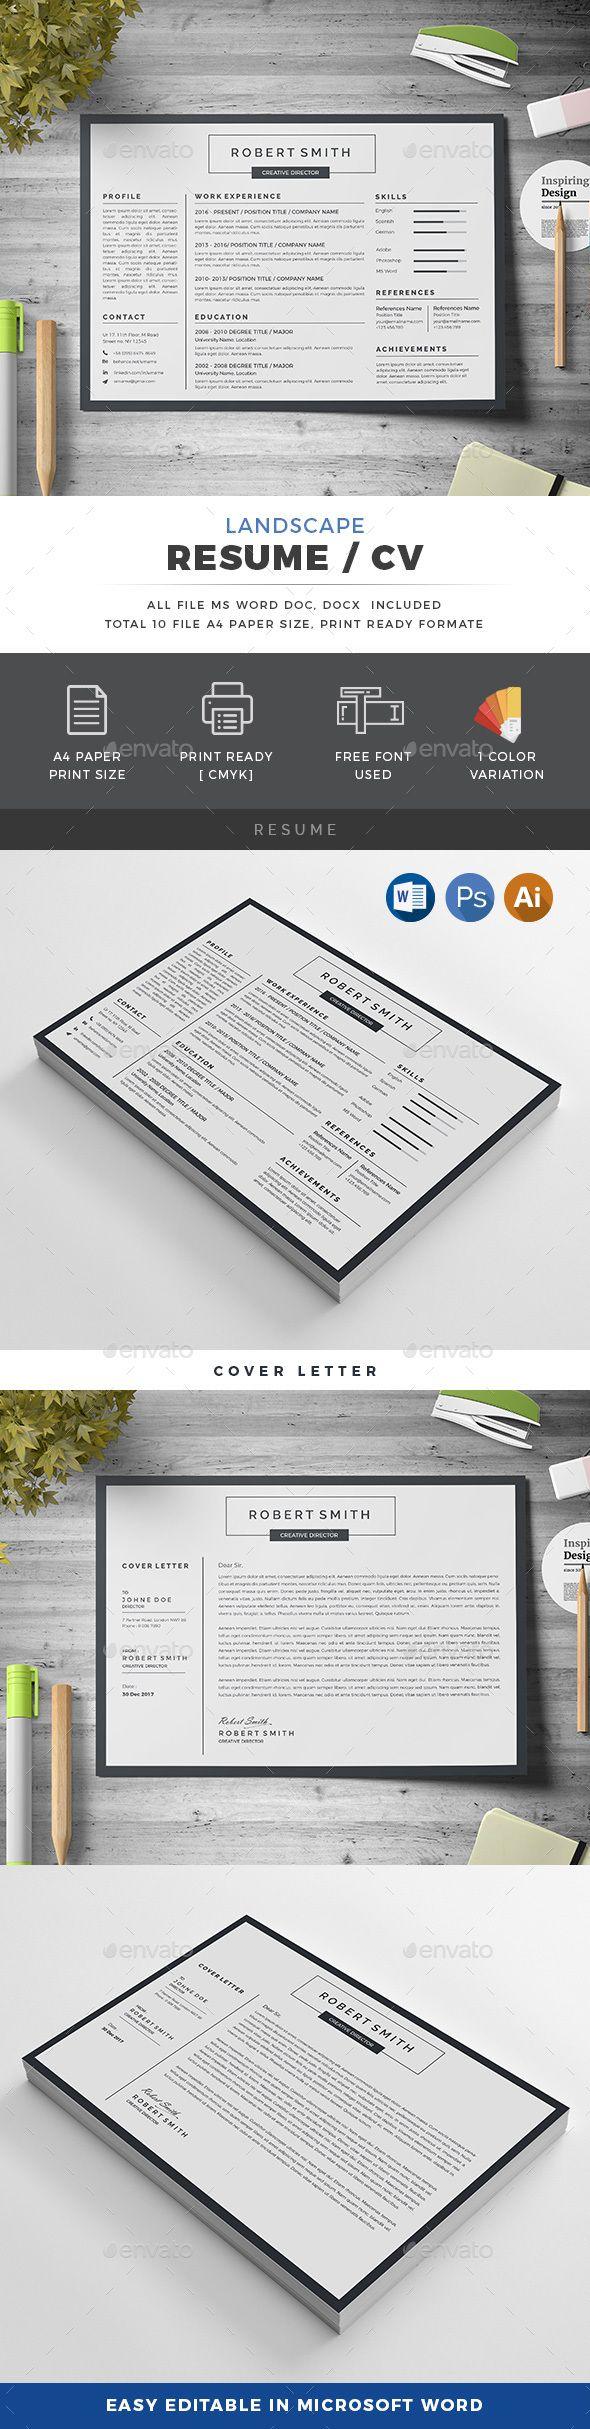 printable resume format%0A  modern  clean  simple  professional  minimalist  Landscape  resume   template